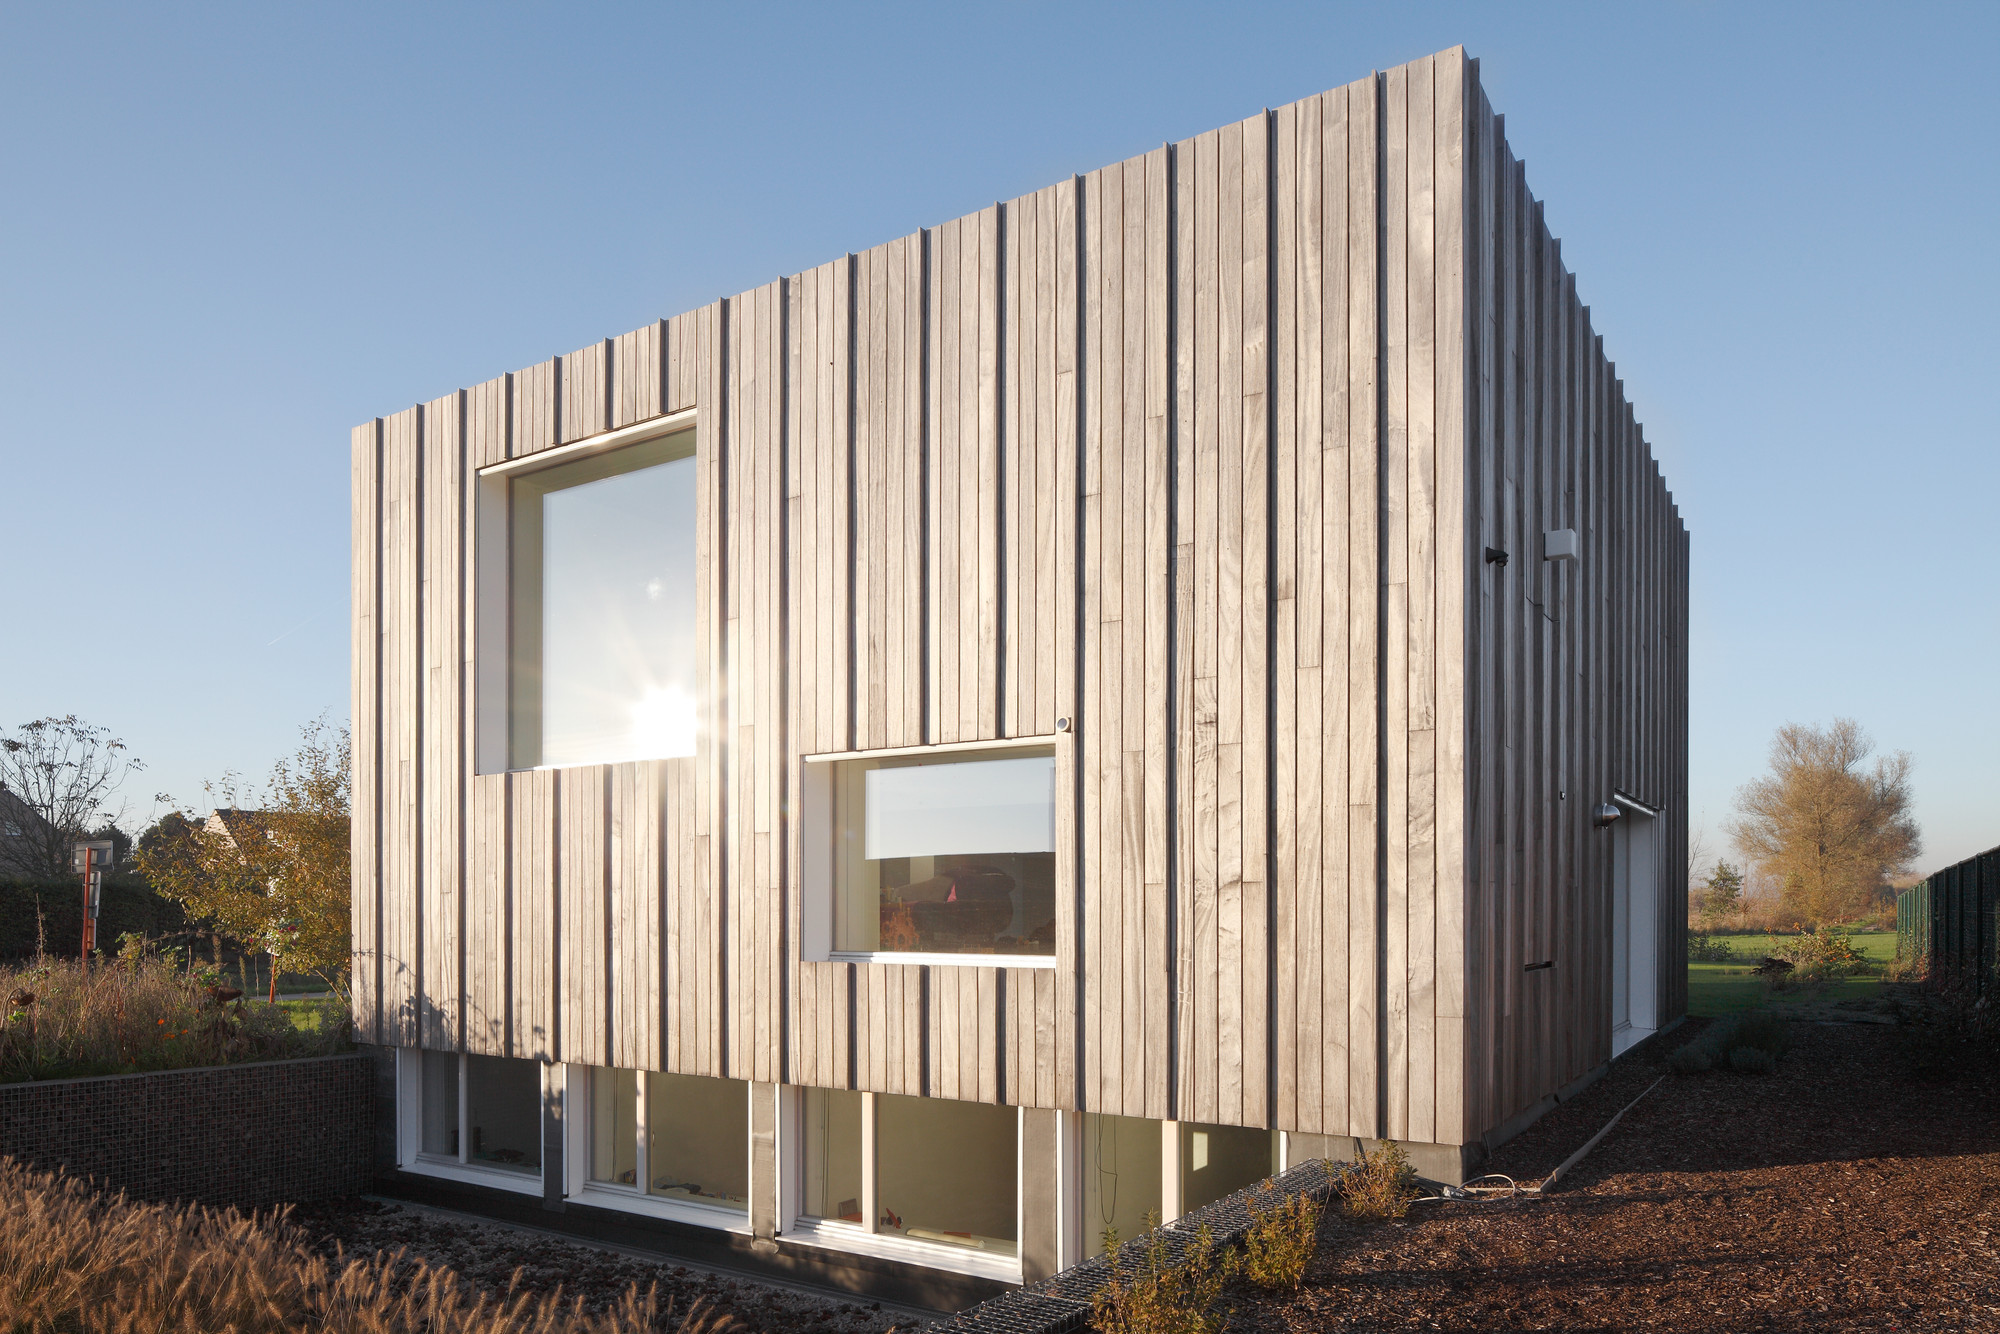 Gallery of zero energy house lokeren blaf architecten 4 Zero energy homes